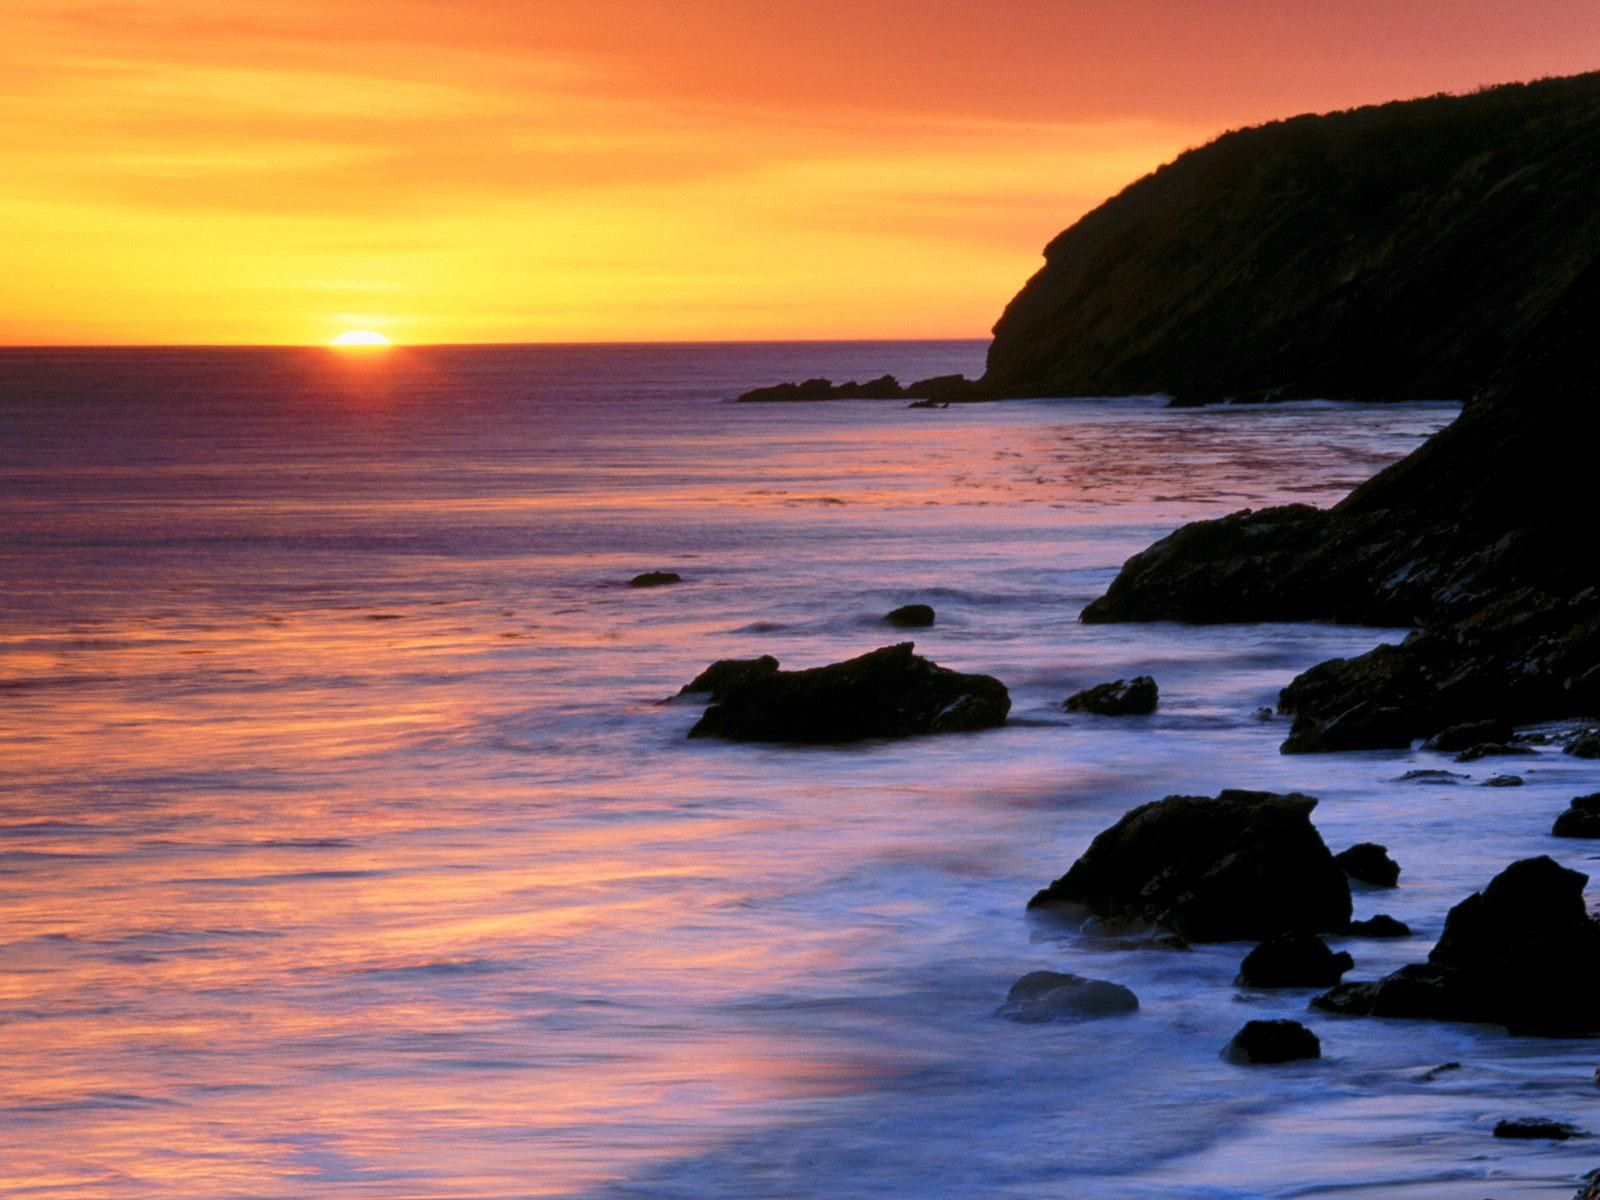 Sunset landscape pacific ocean sunset landscape free for Sfondi desktop tramonti mare